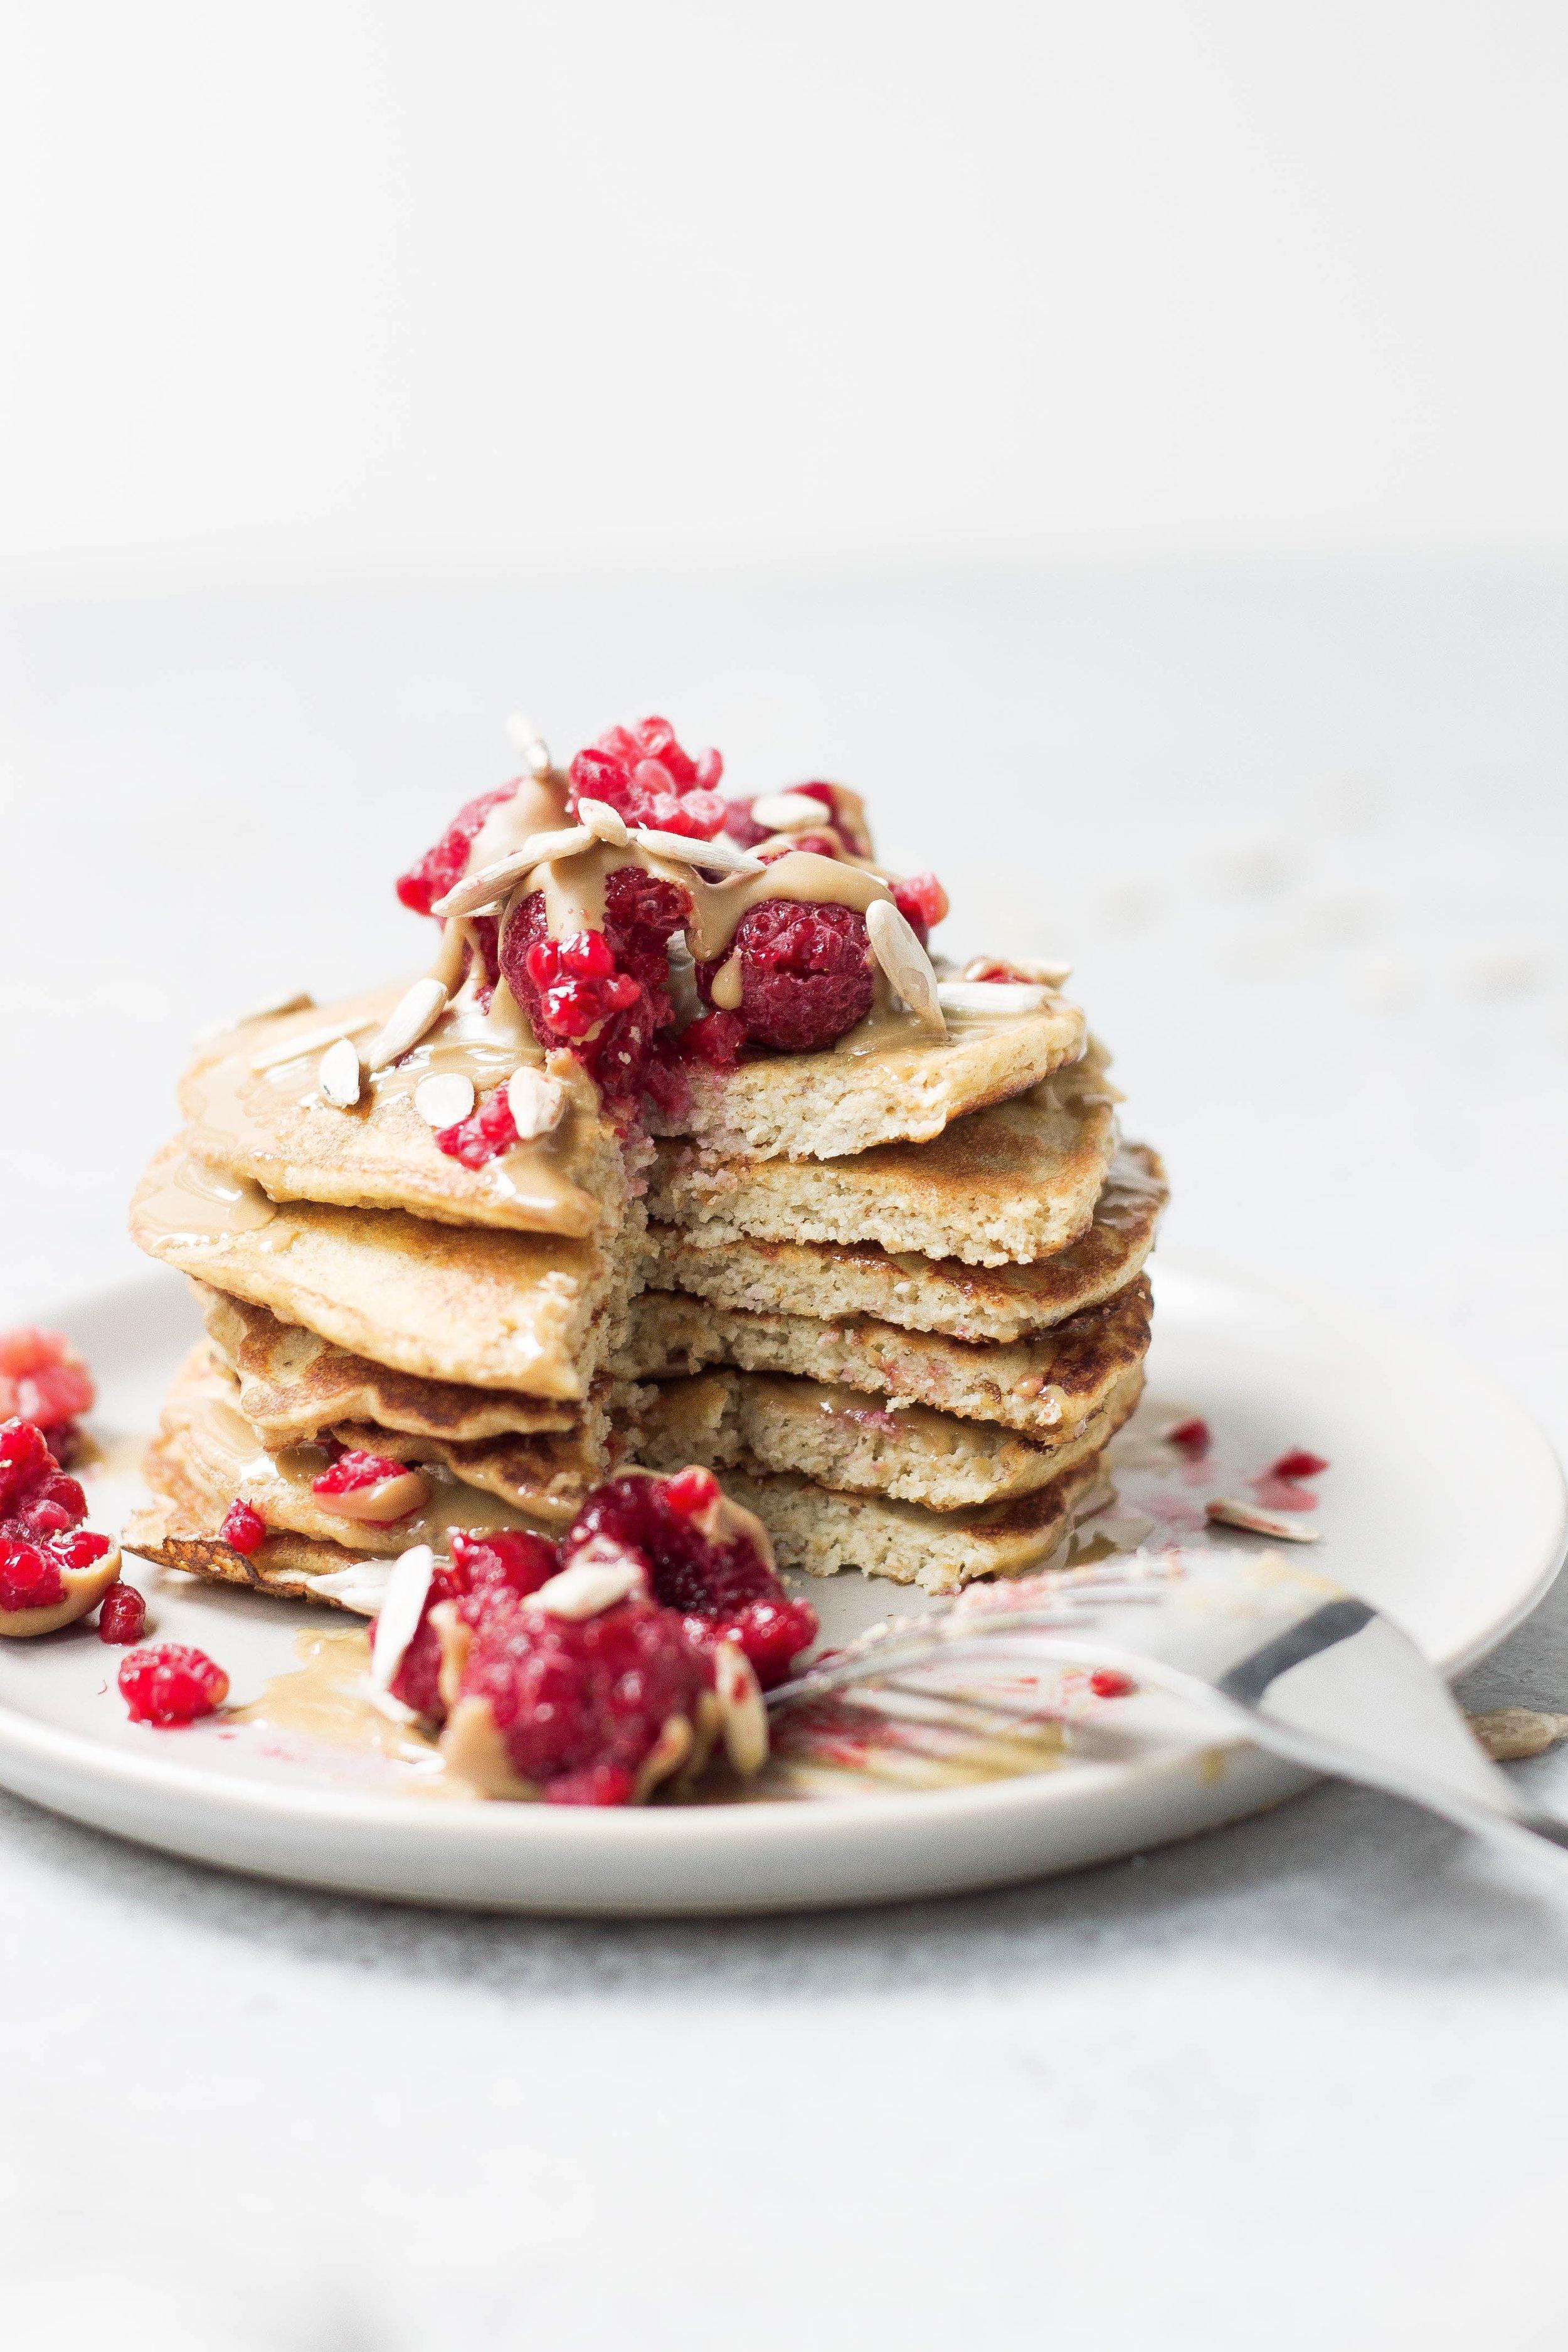 vegan-banana-pancakes-healthy.jpg